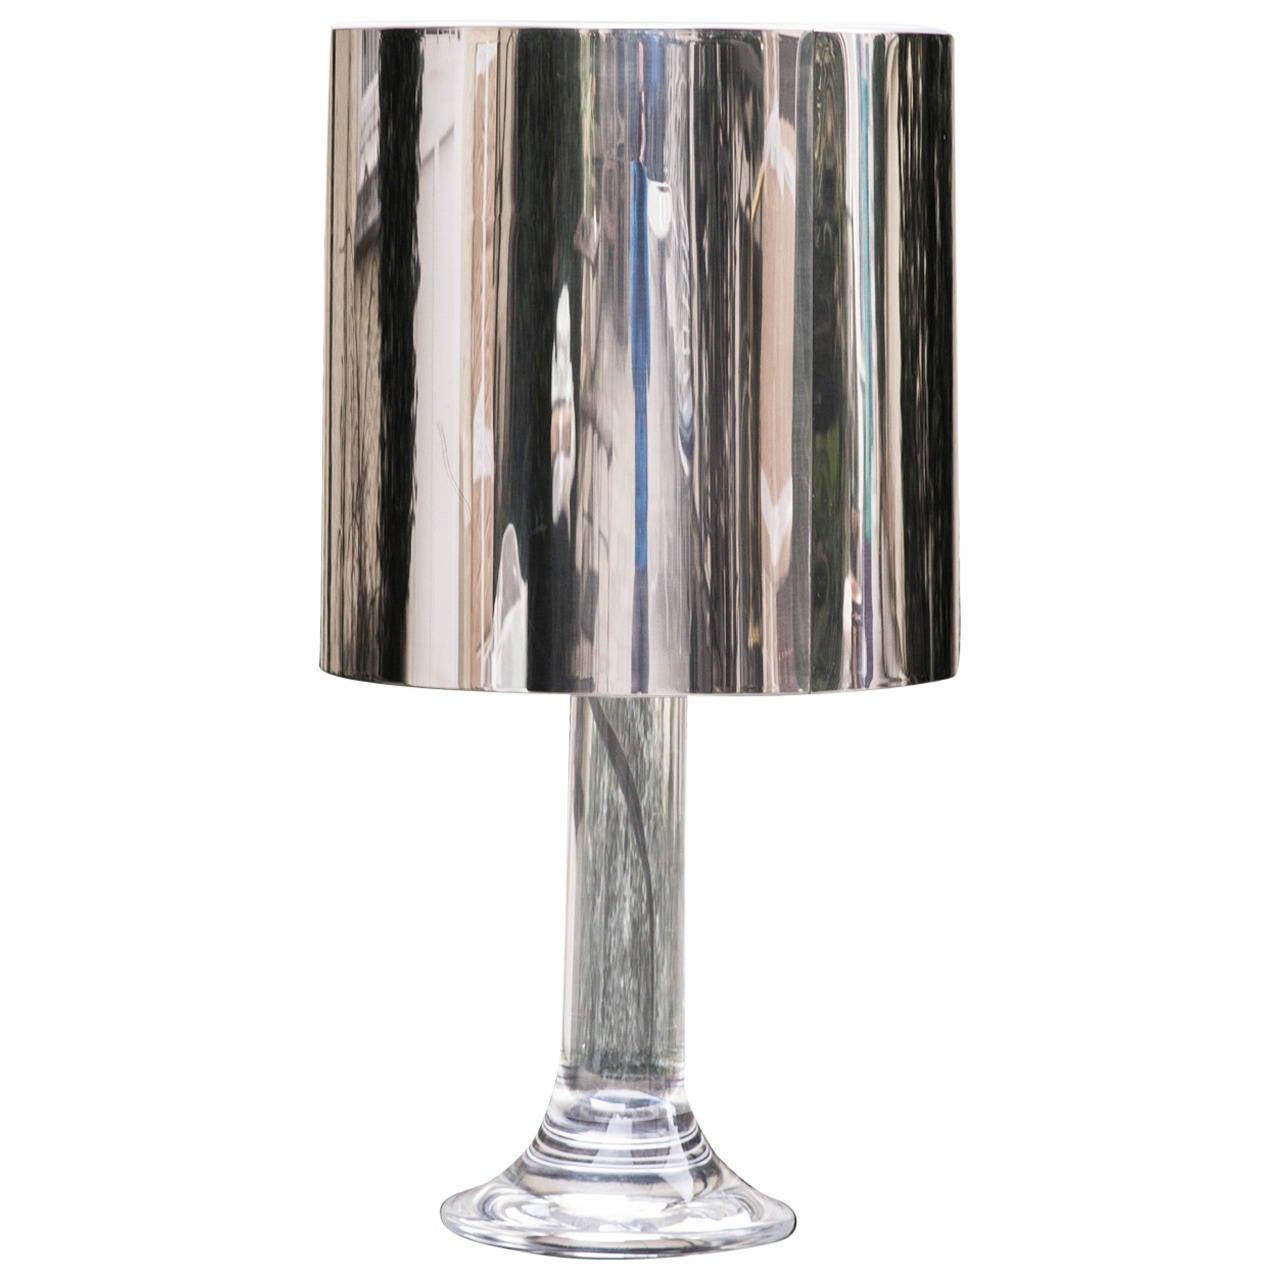 Harvey Guzzini Lucite Table Lamp At 1stdibs